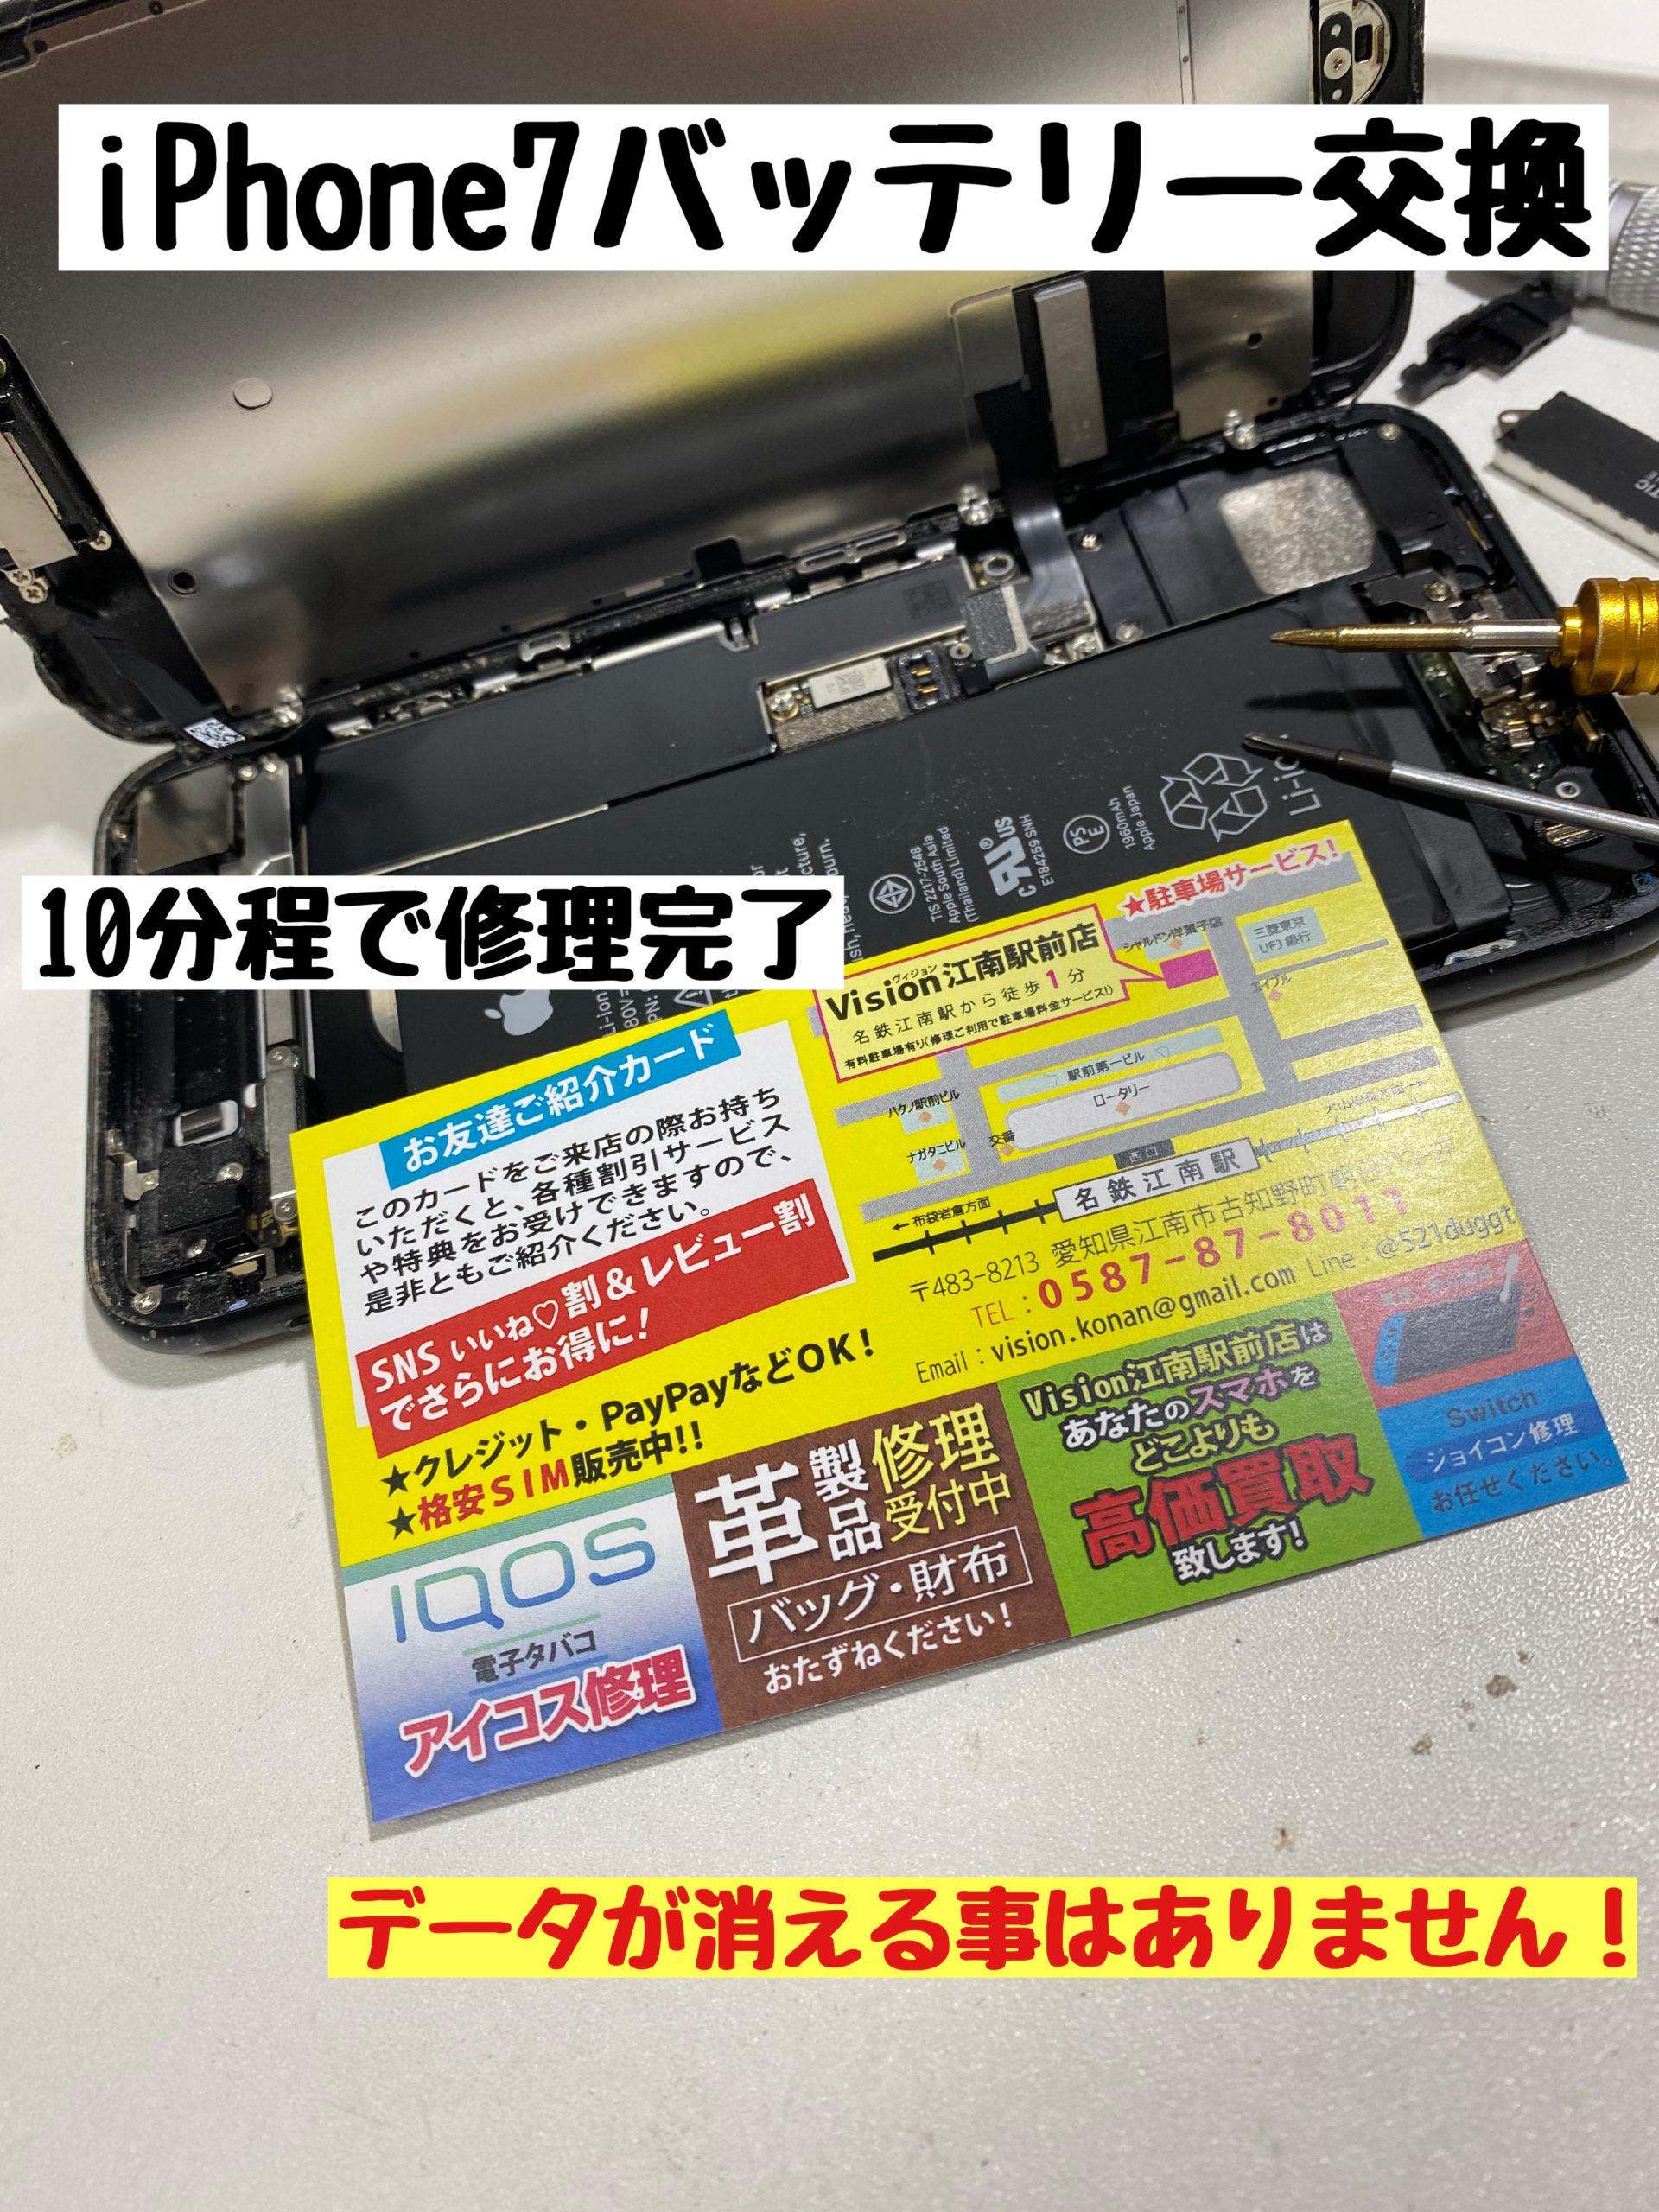 iPhone7 アイフォン7 電池不良 バッテリー交換 犬山市 扶桑町 電池交換 江南市 犬山